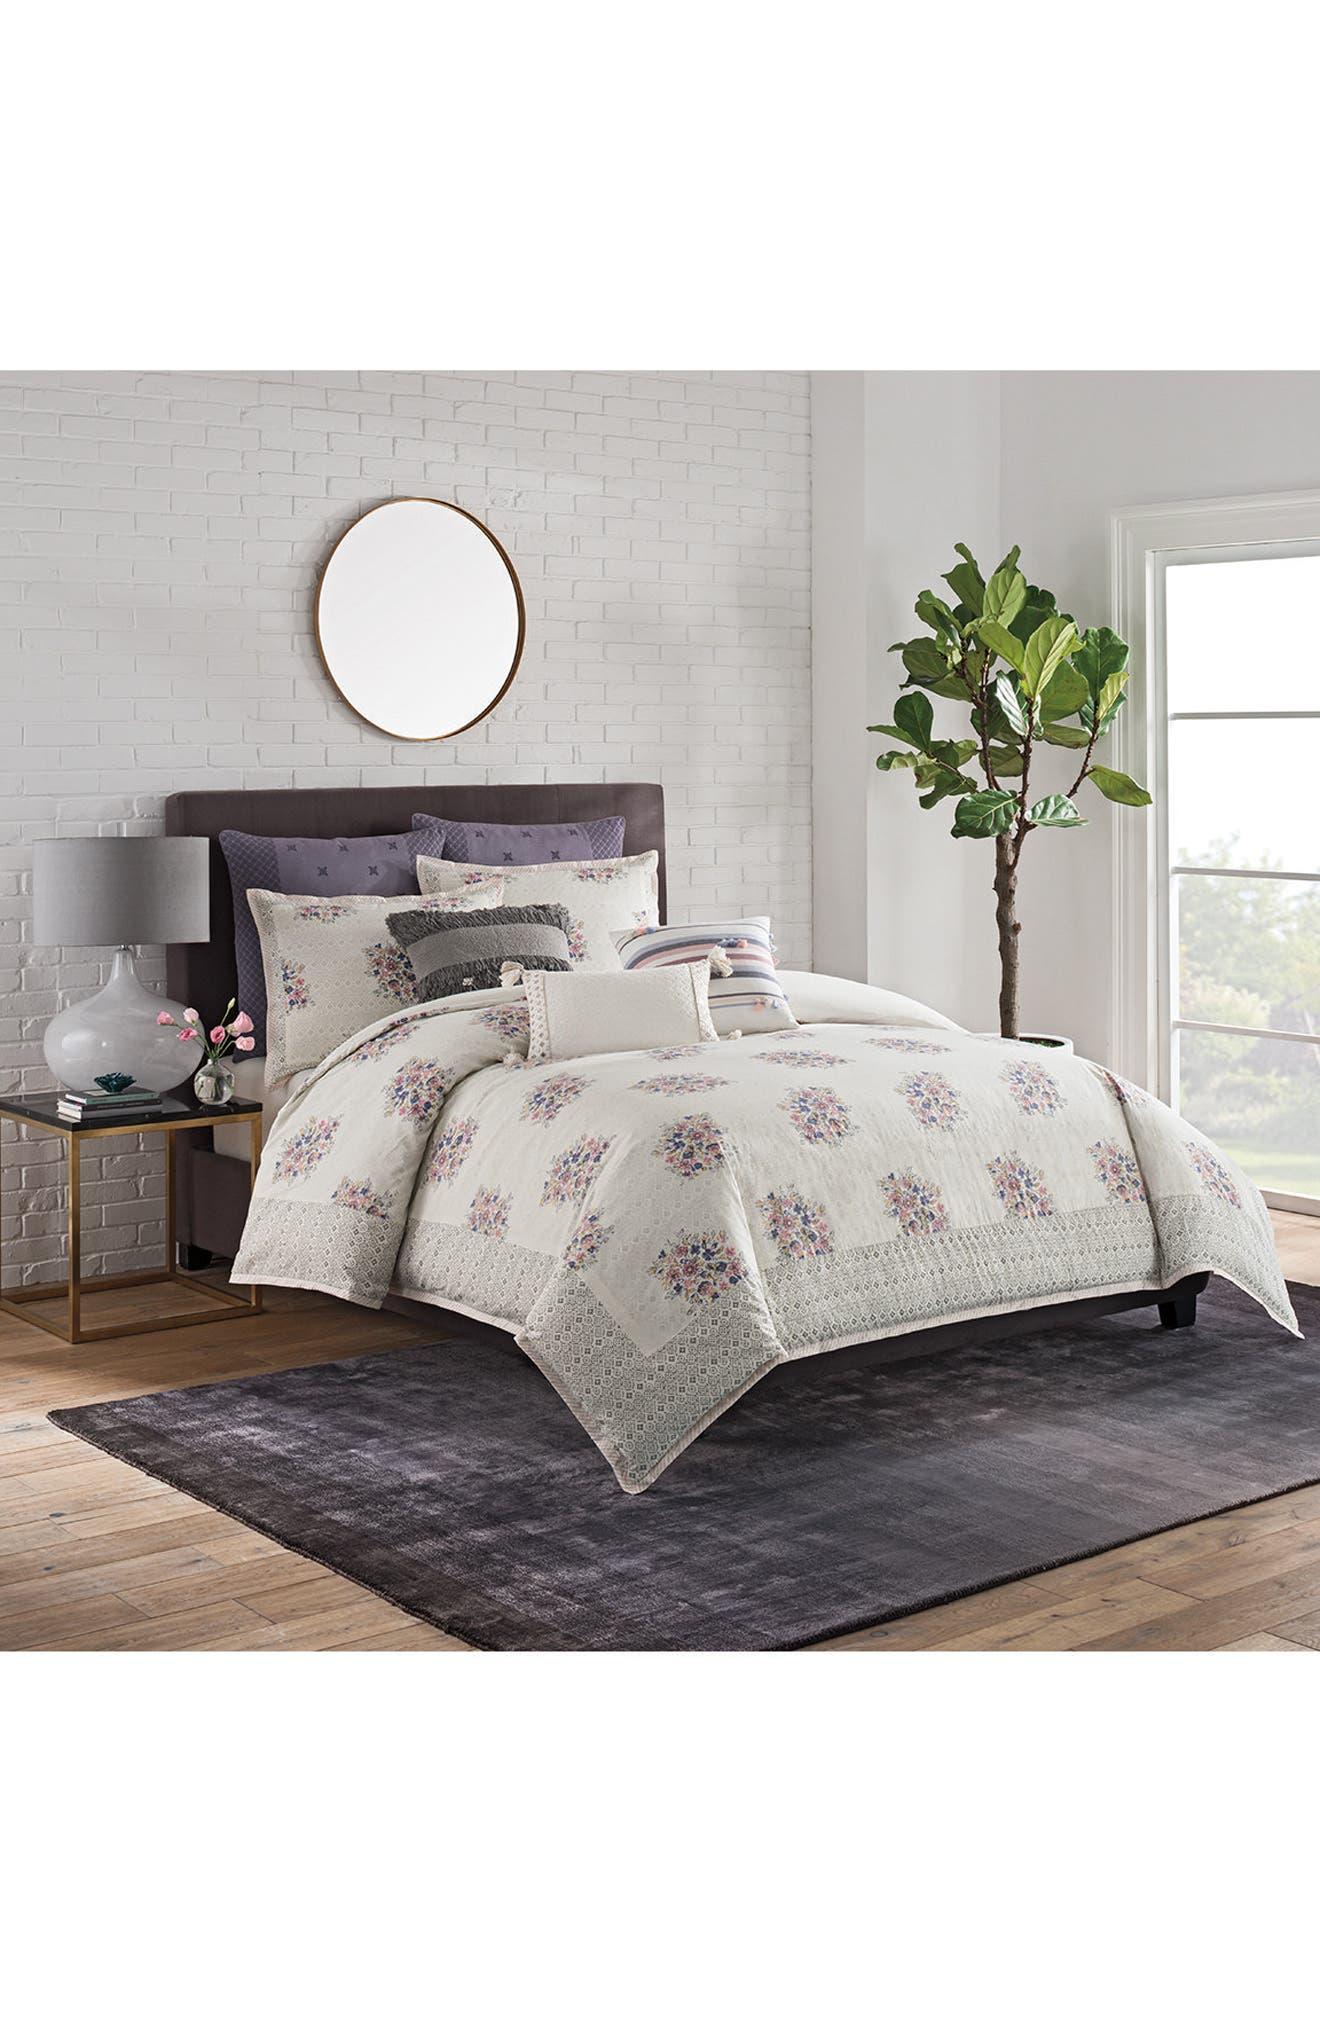 Block Print Floral Duvet Cover,                         Main,                         color, White Multi